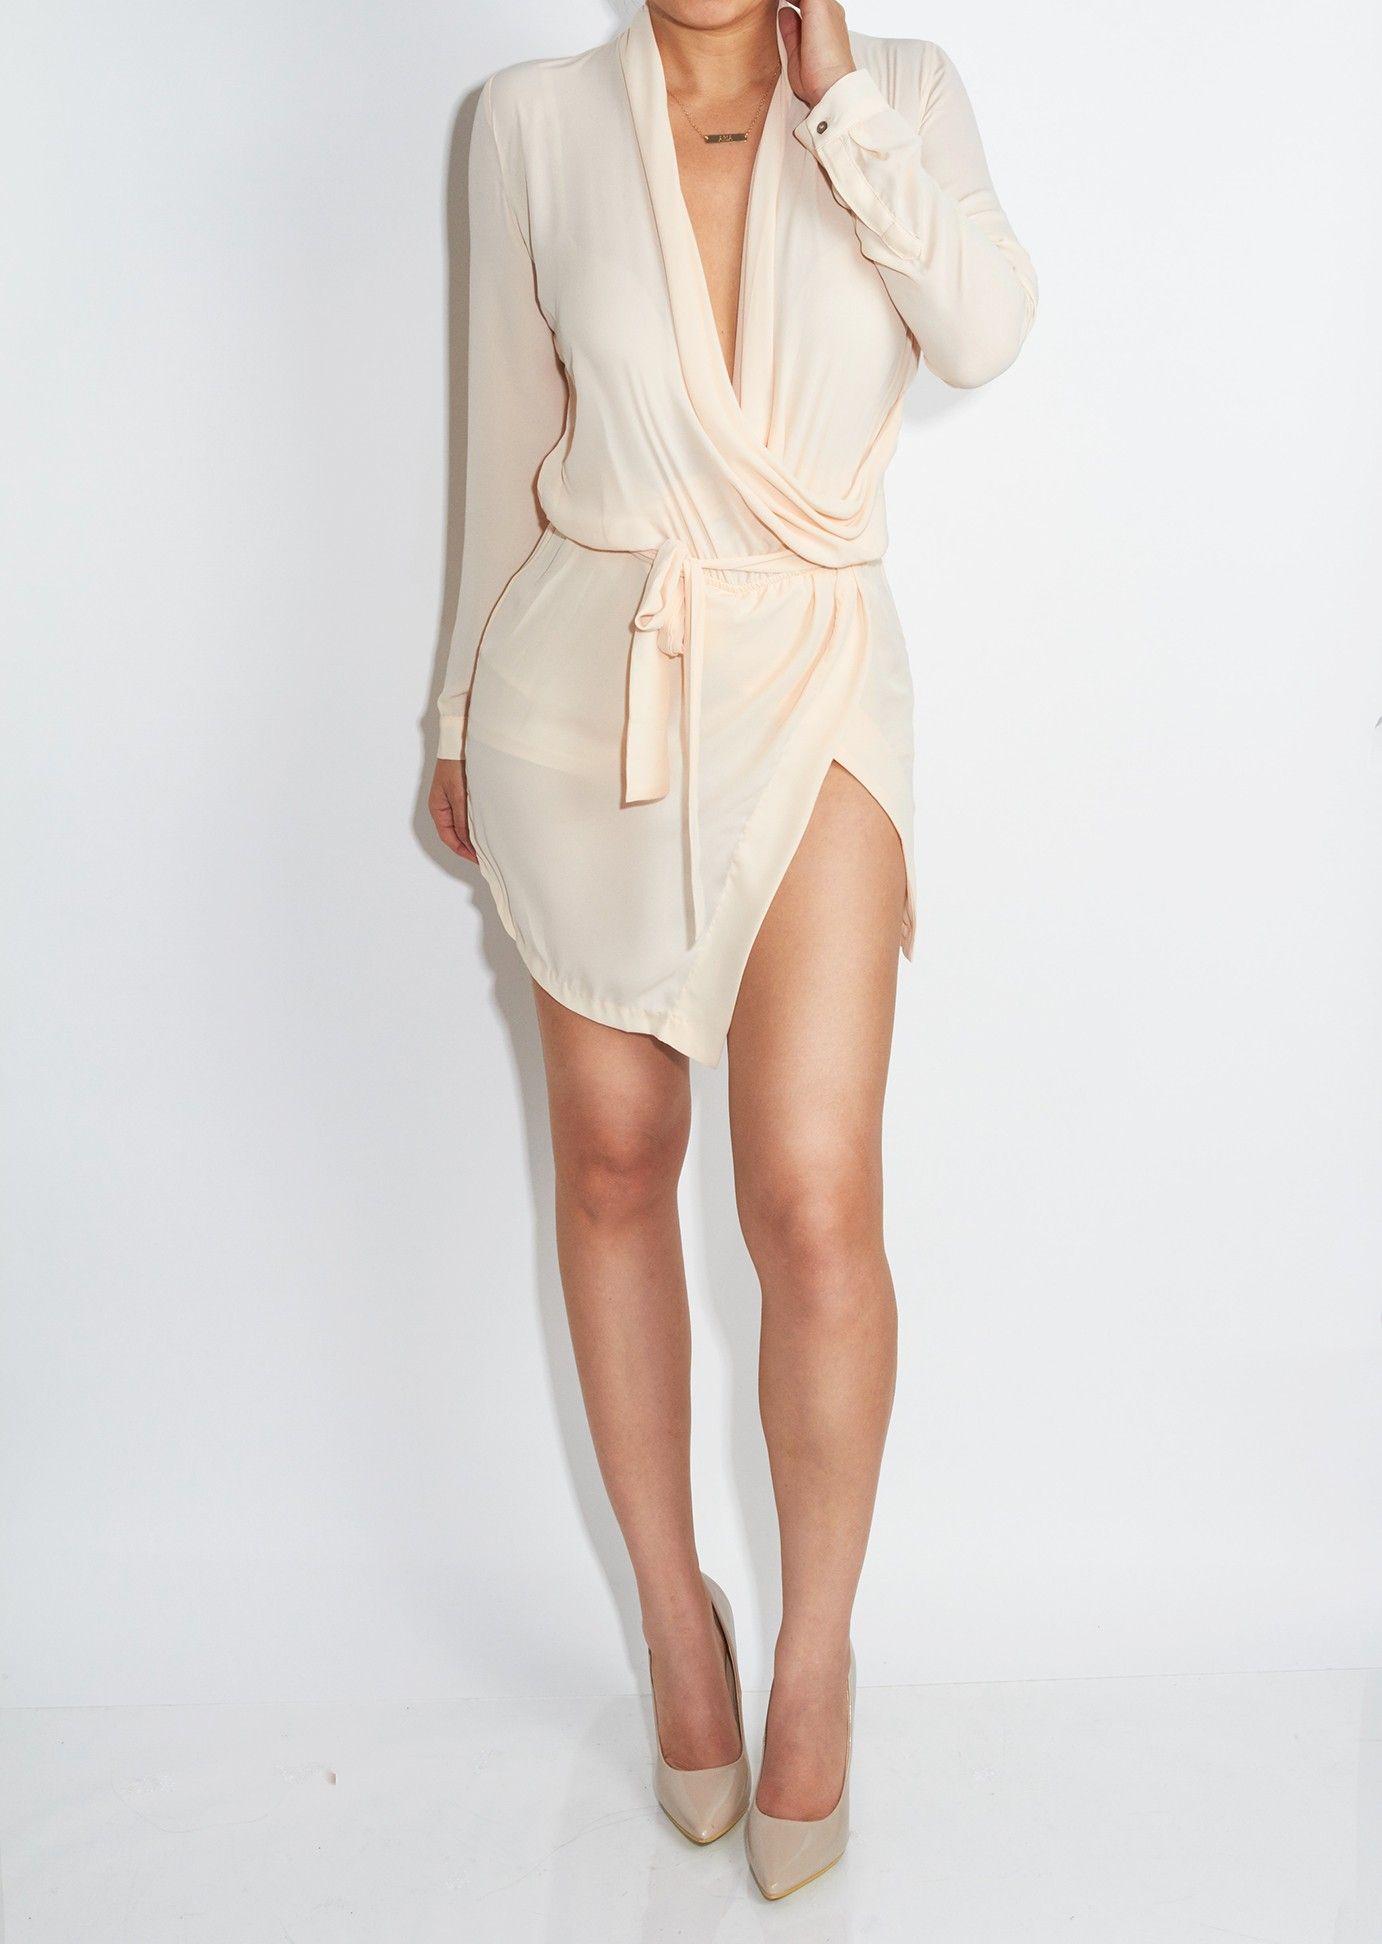 JLUXLABEL French Vanilla Mini Blouse Dress | Jluxlabel | Pinterest ...